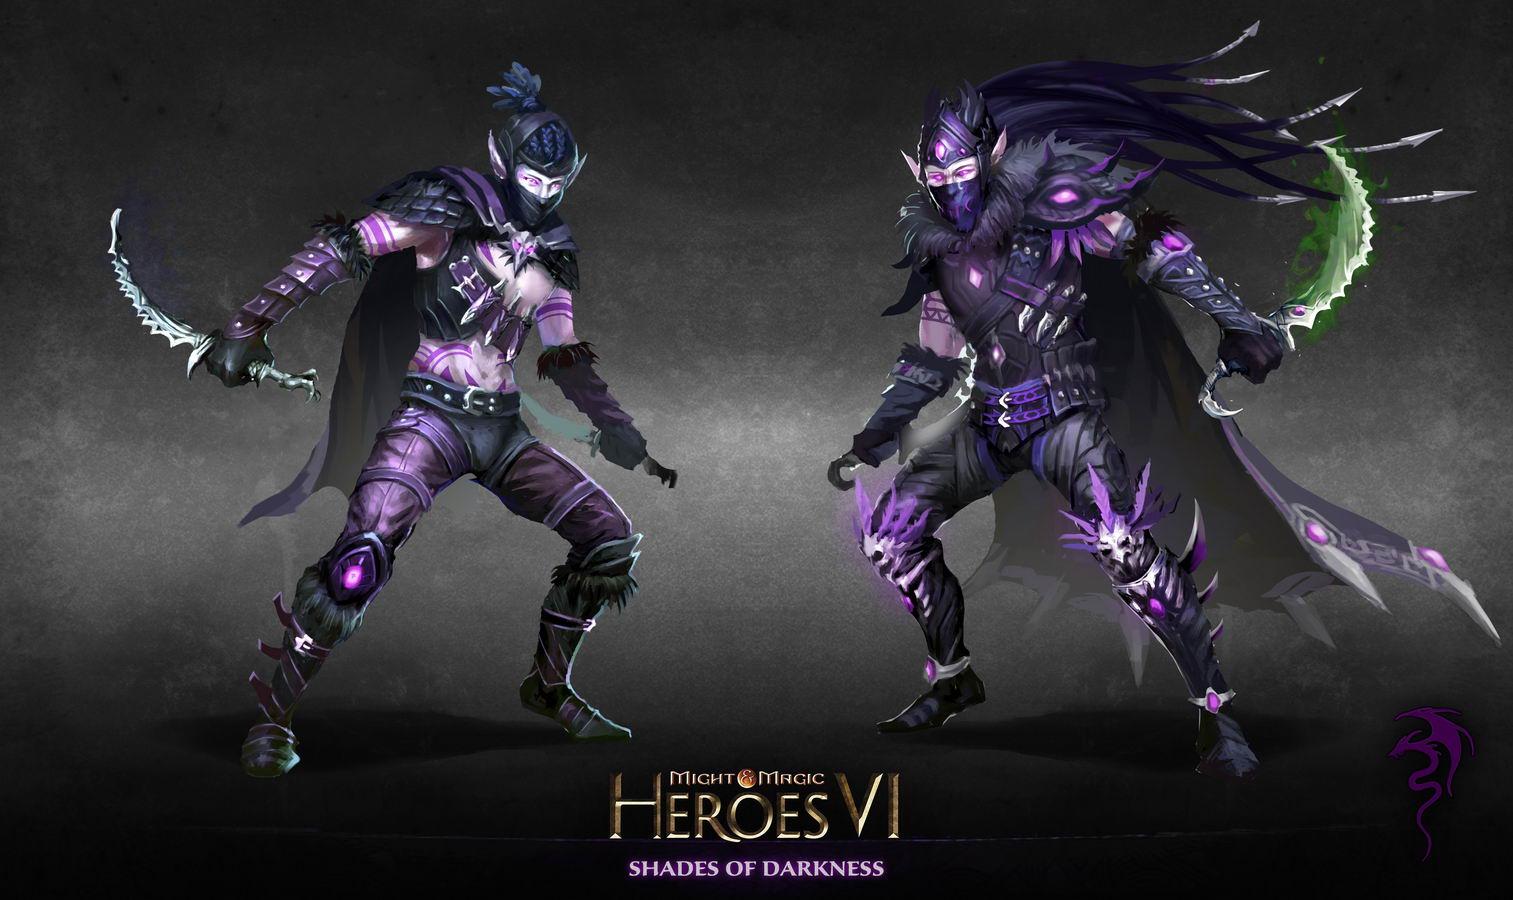 Арт Might & Magic Heroes VI - Shades of Darkness